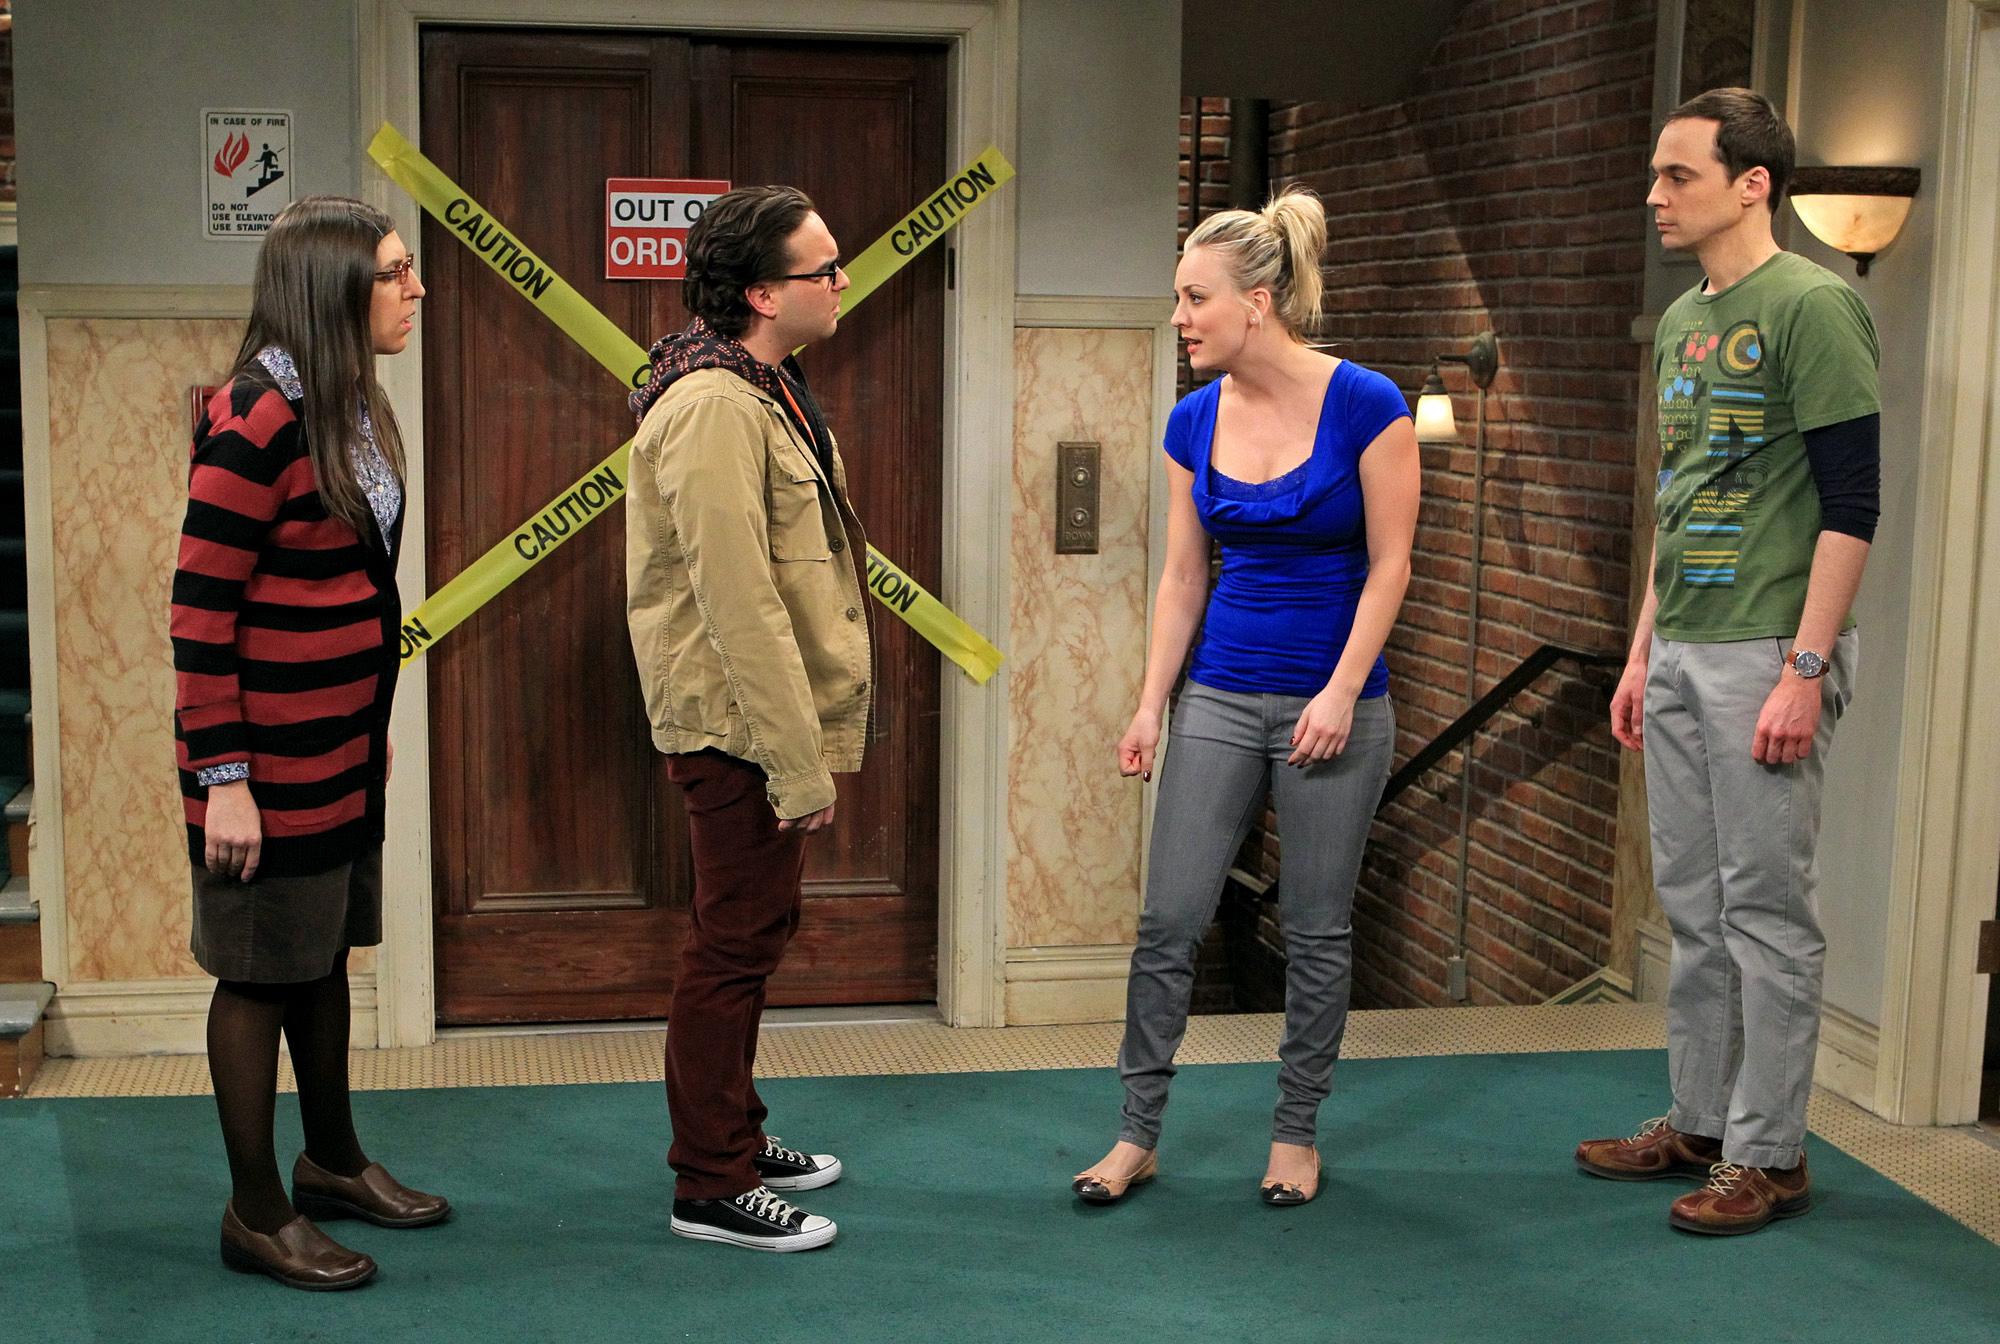 Amy, Leonard, Penny & Sheldon